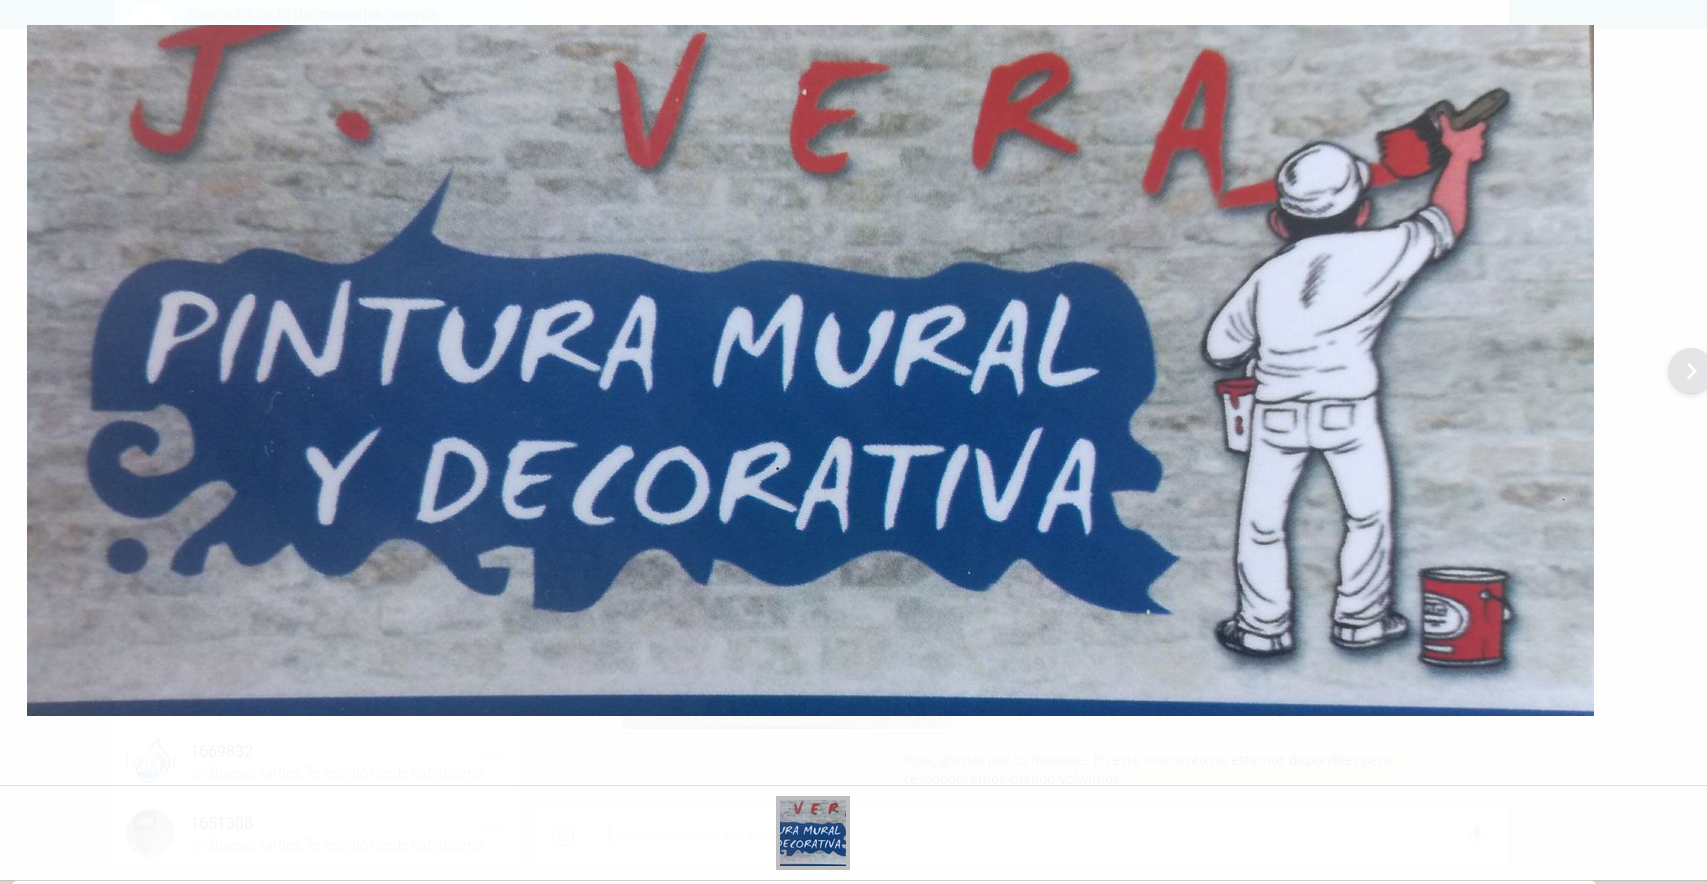 J. Vera Pintura Mural Y Decorativa